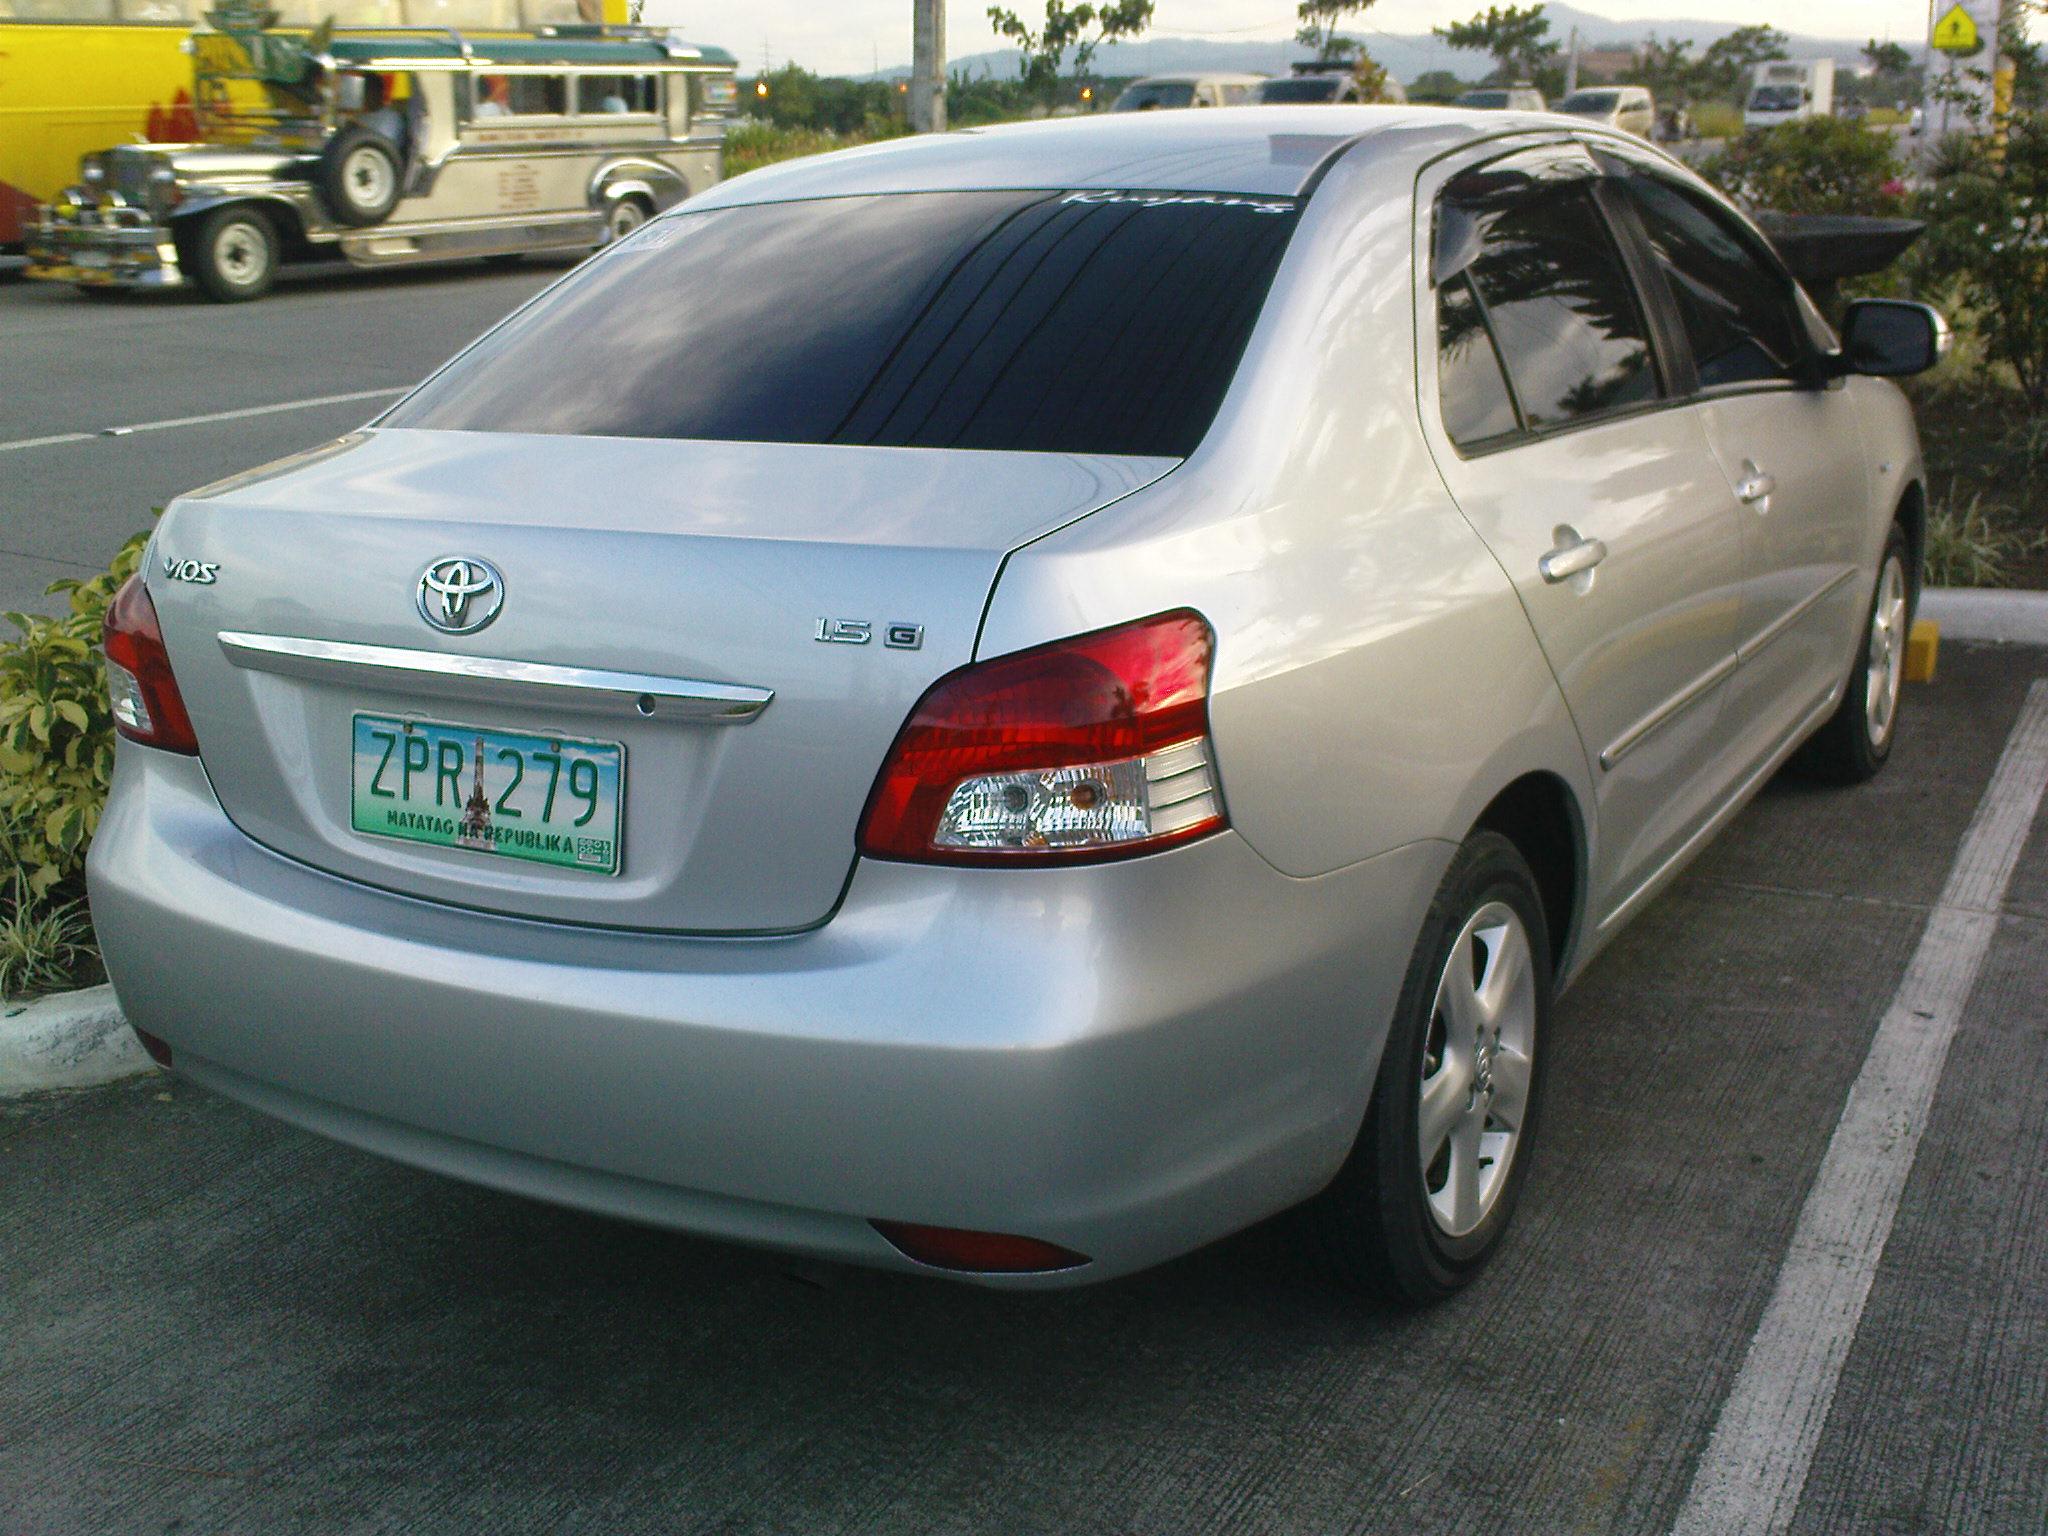 Kekurangan Toyota Vios 2009 Perbandingan Harga